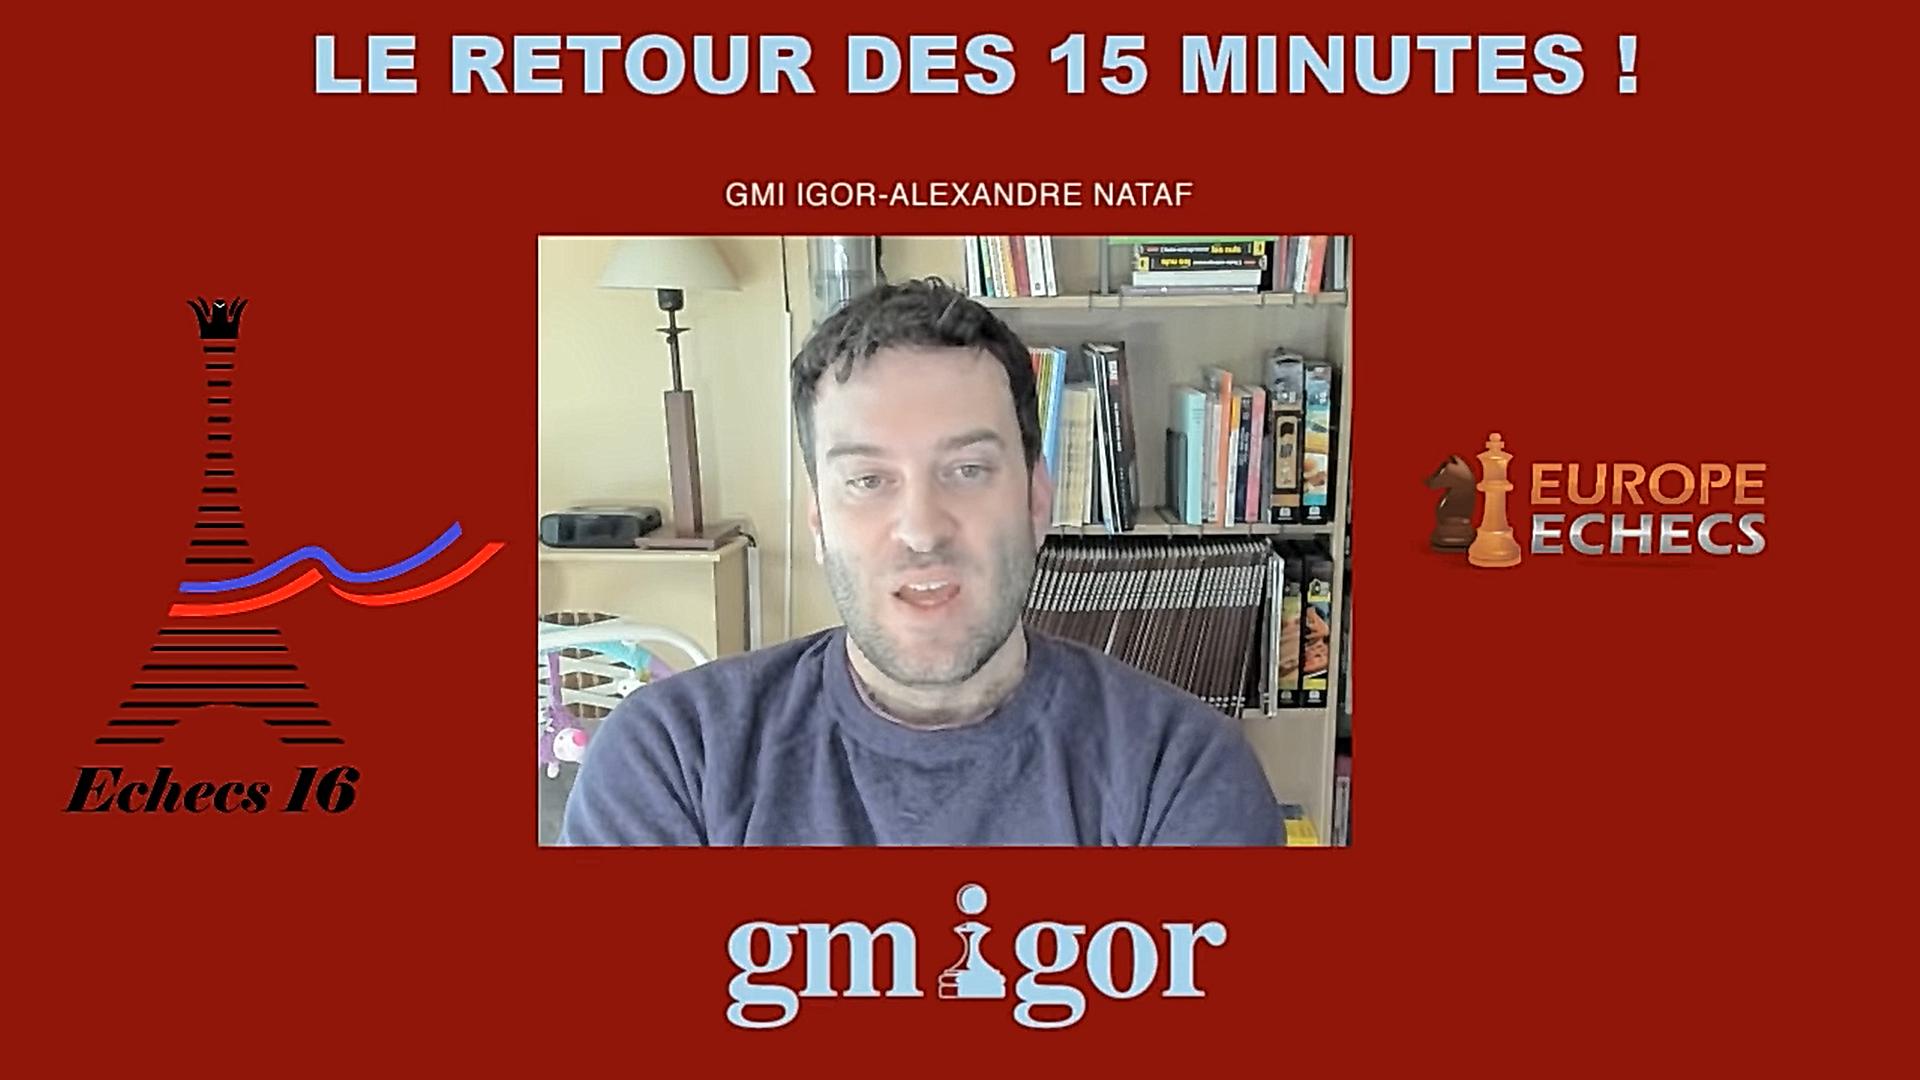 Le retour des 15 minutes avec Igor Nataf !